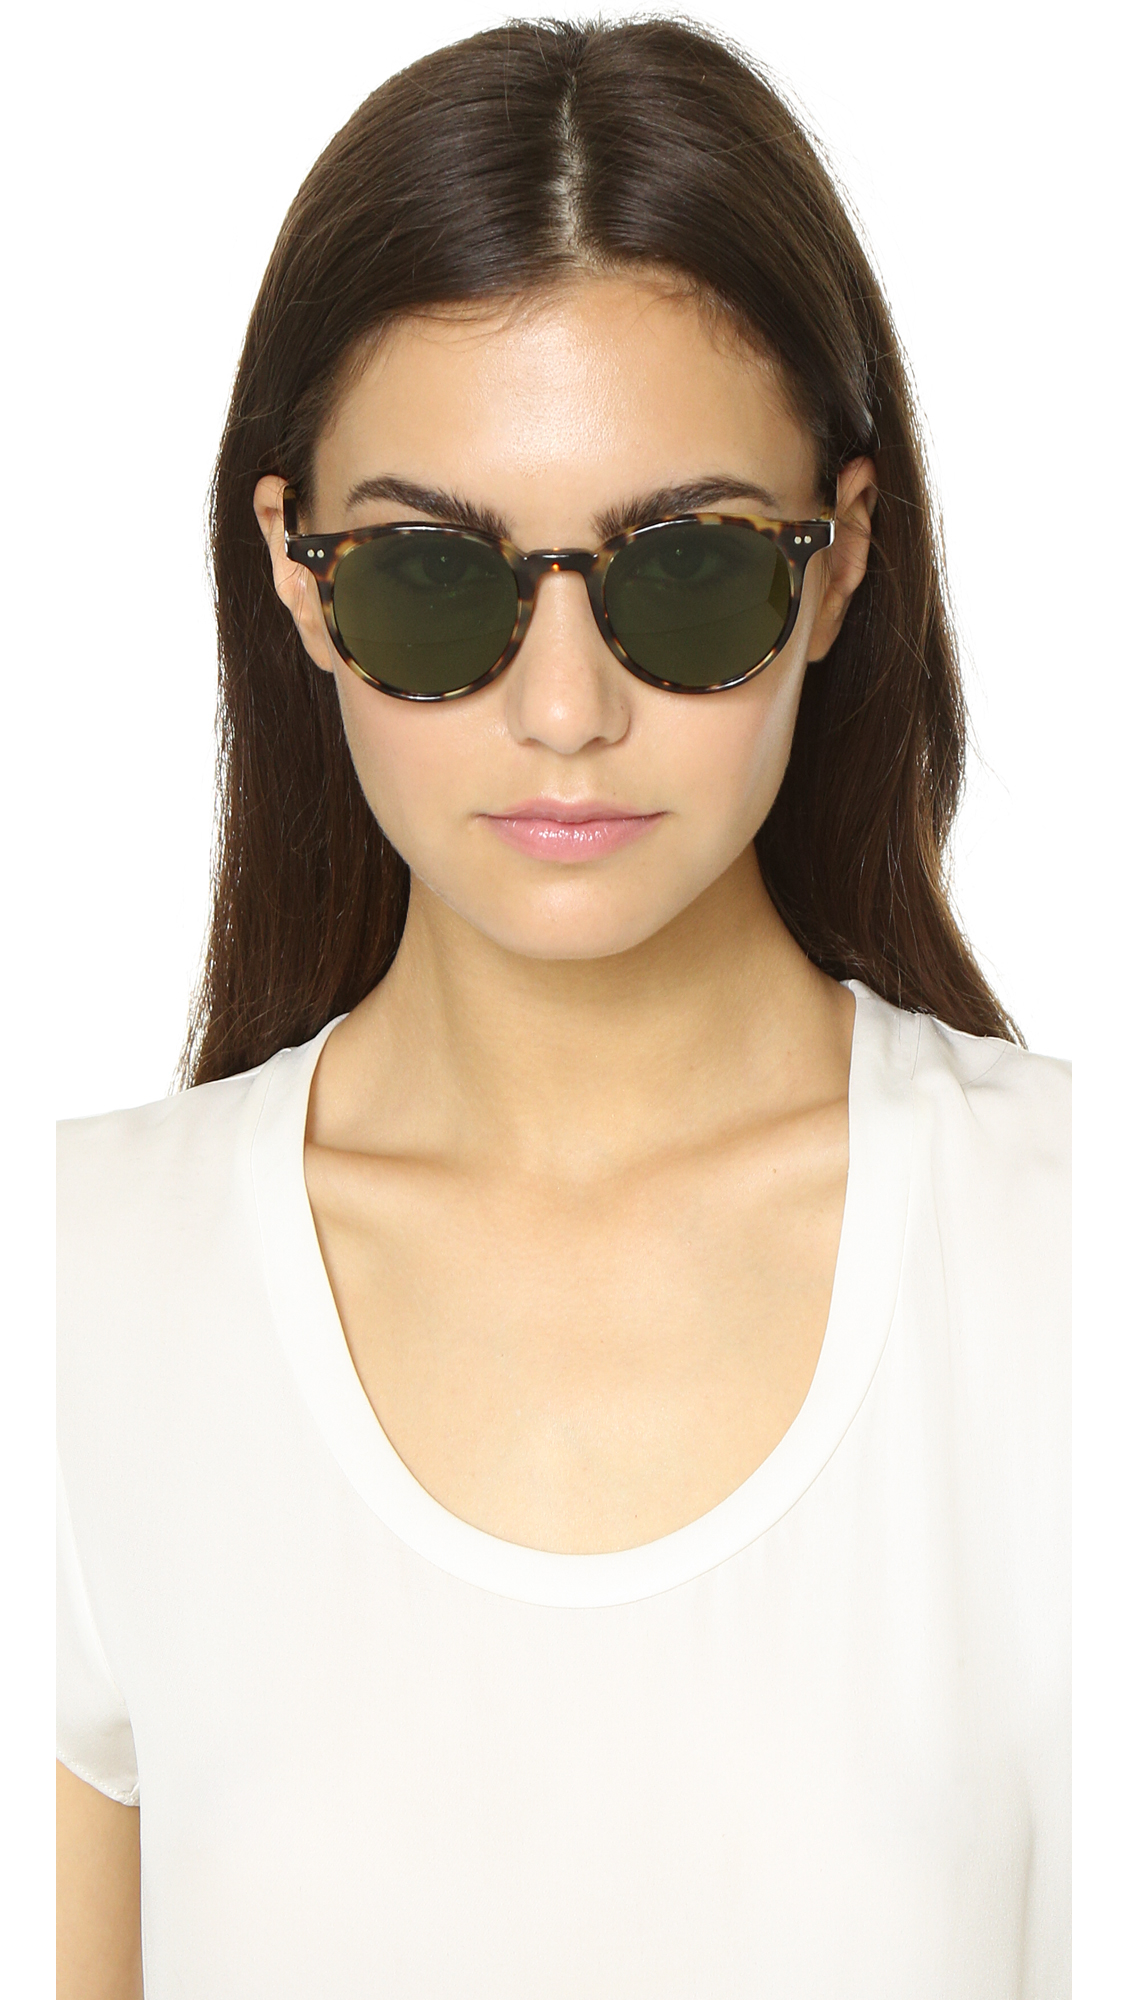 74ae8c36e3 Lyst - Oliver Peoples Delray Sunglasses - Dark Tortoise Brown green ...